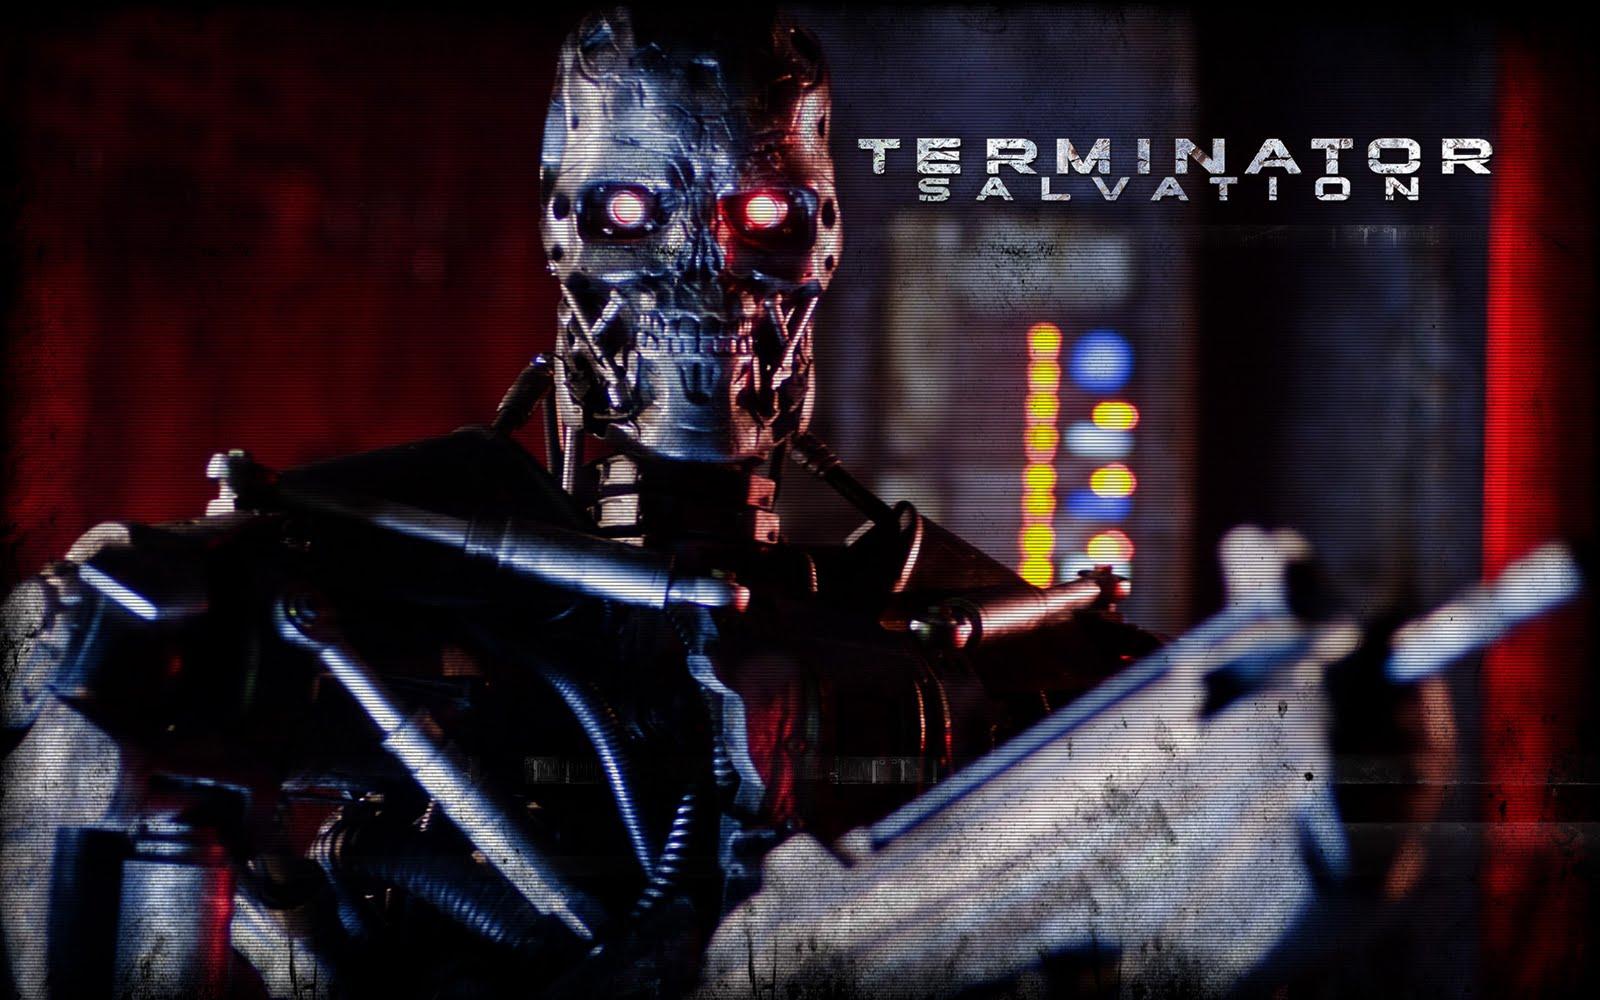 http://1.bp.blogspot.com/--WvaJLjpQd4/TdK5Eht-_AI/AAAAAAAAAXU/kF7ZW8-43PE/s1600/Terminator_Salvation_5.jpg